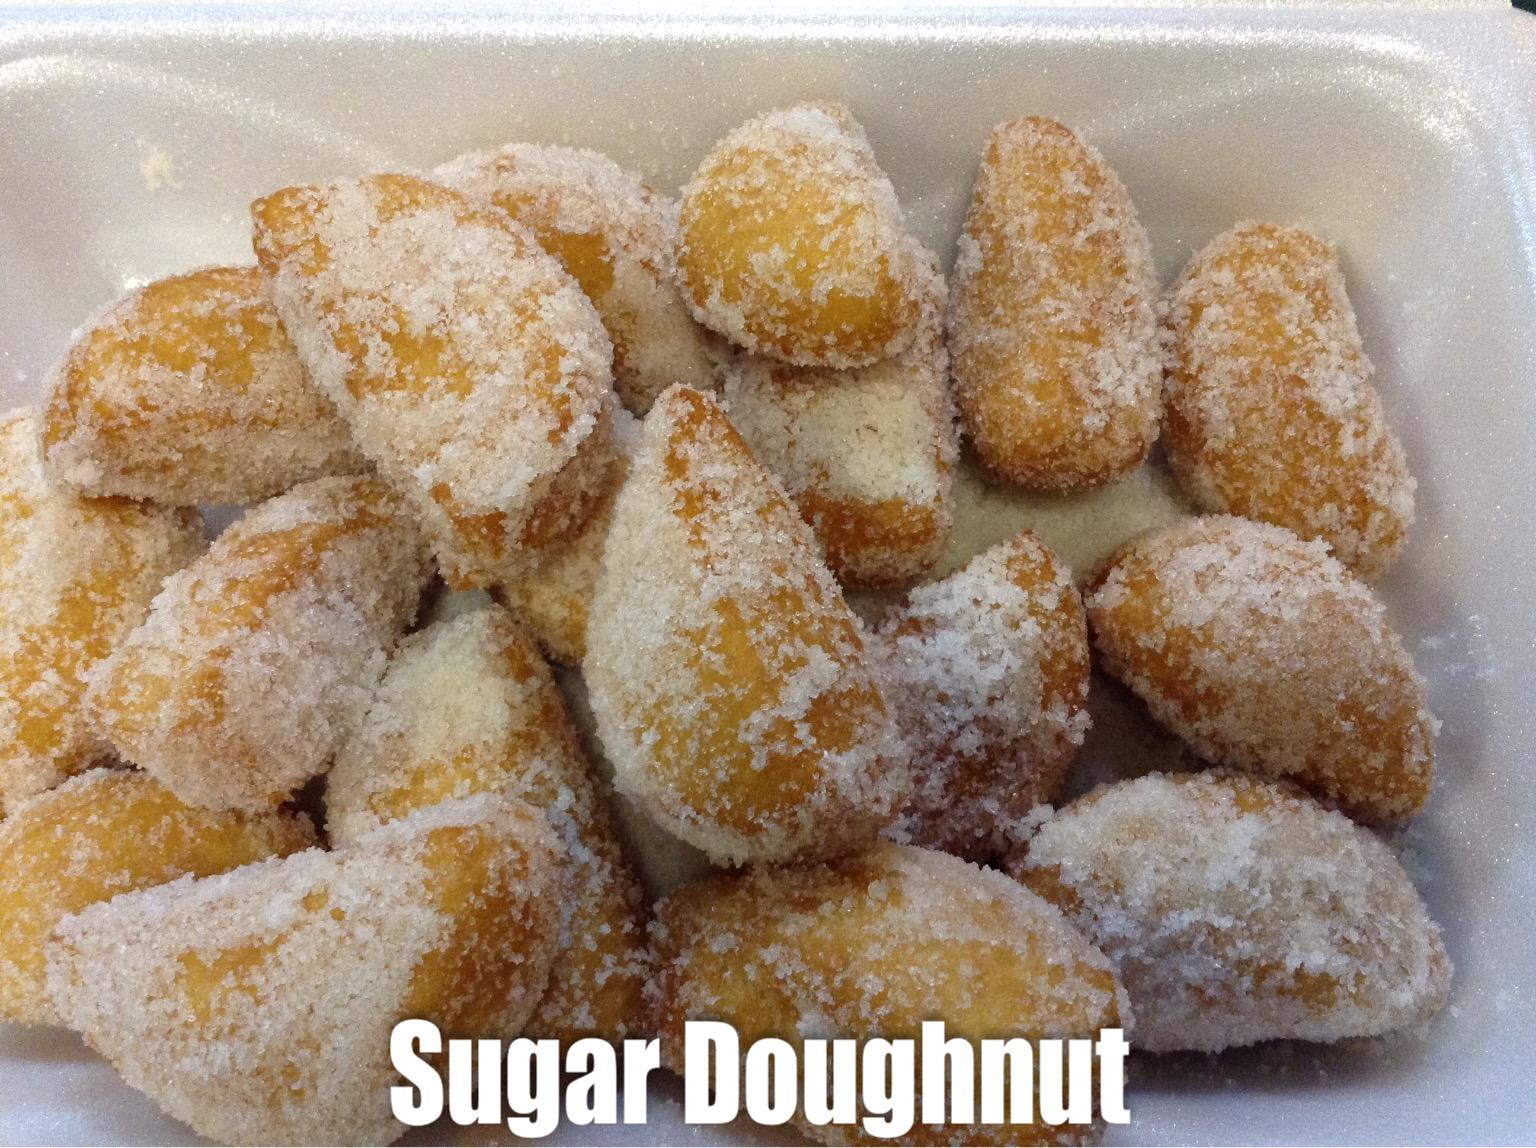 Sugar Doughnut Image